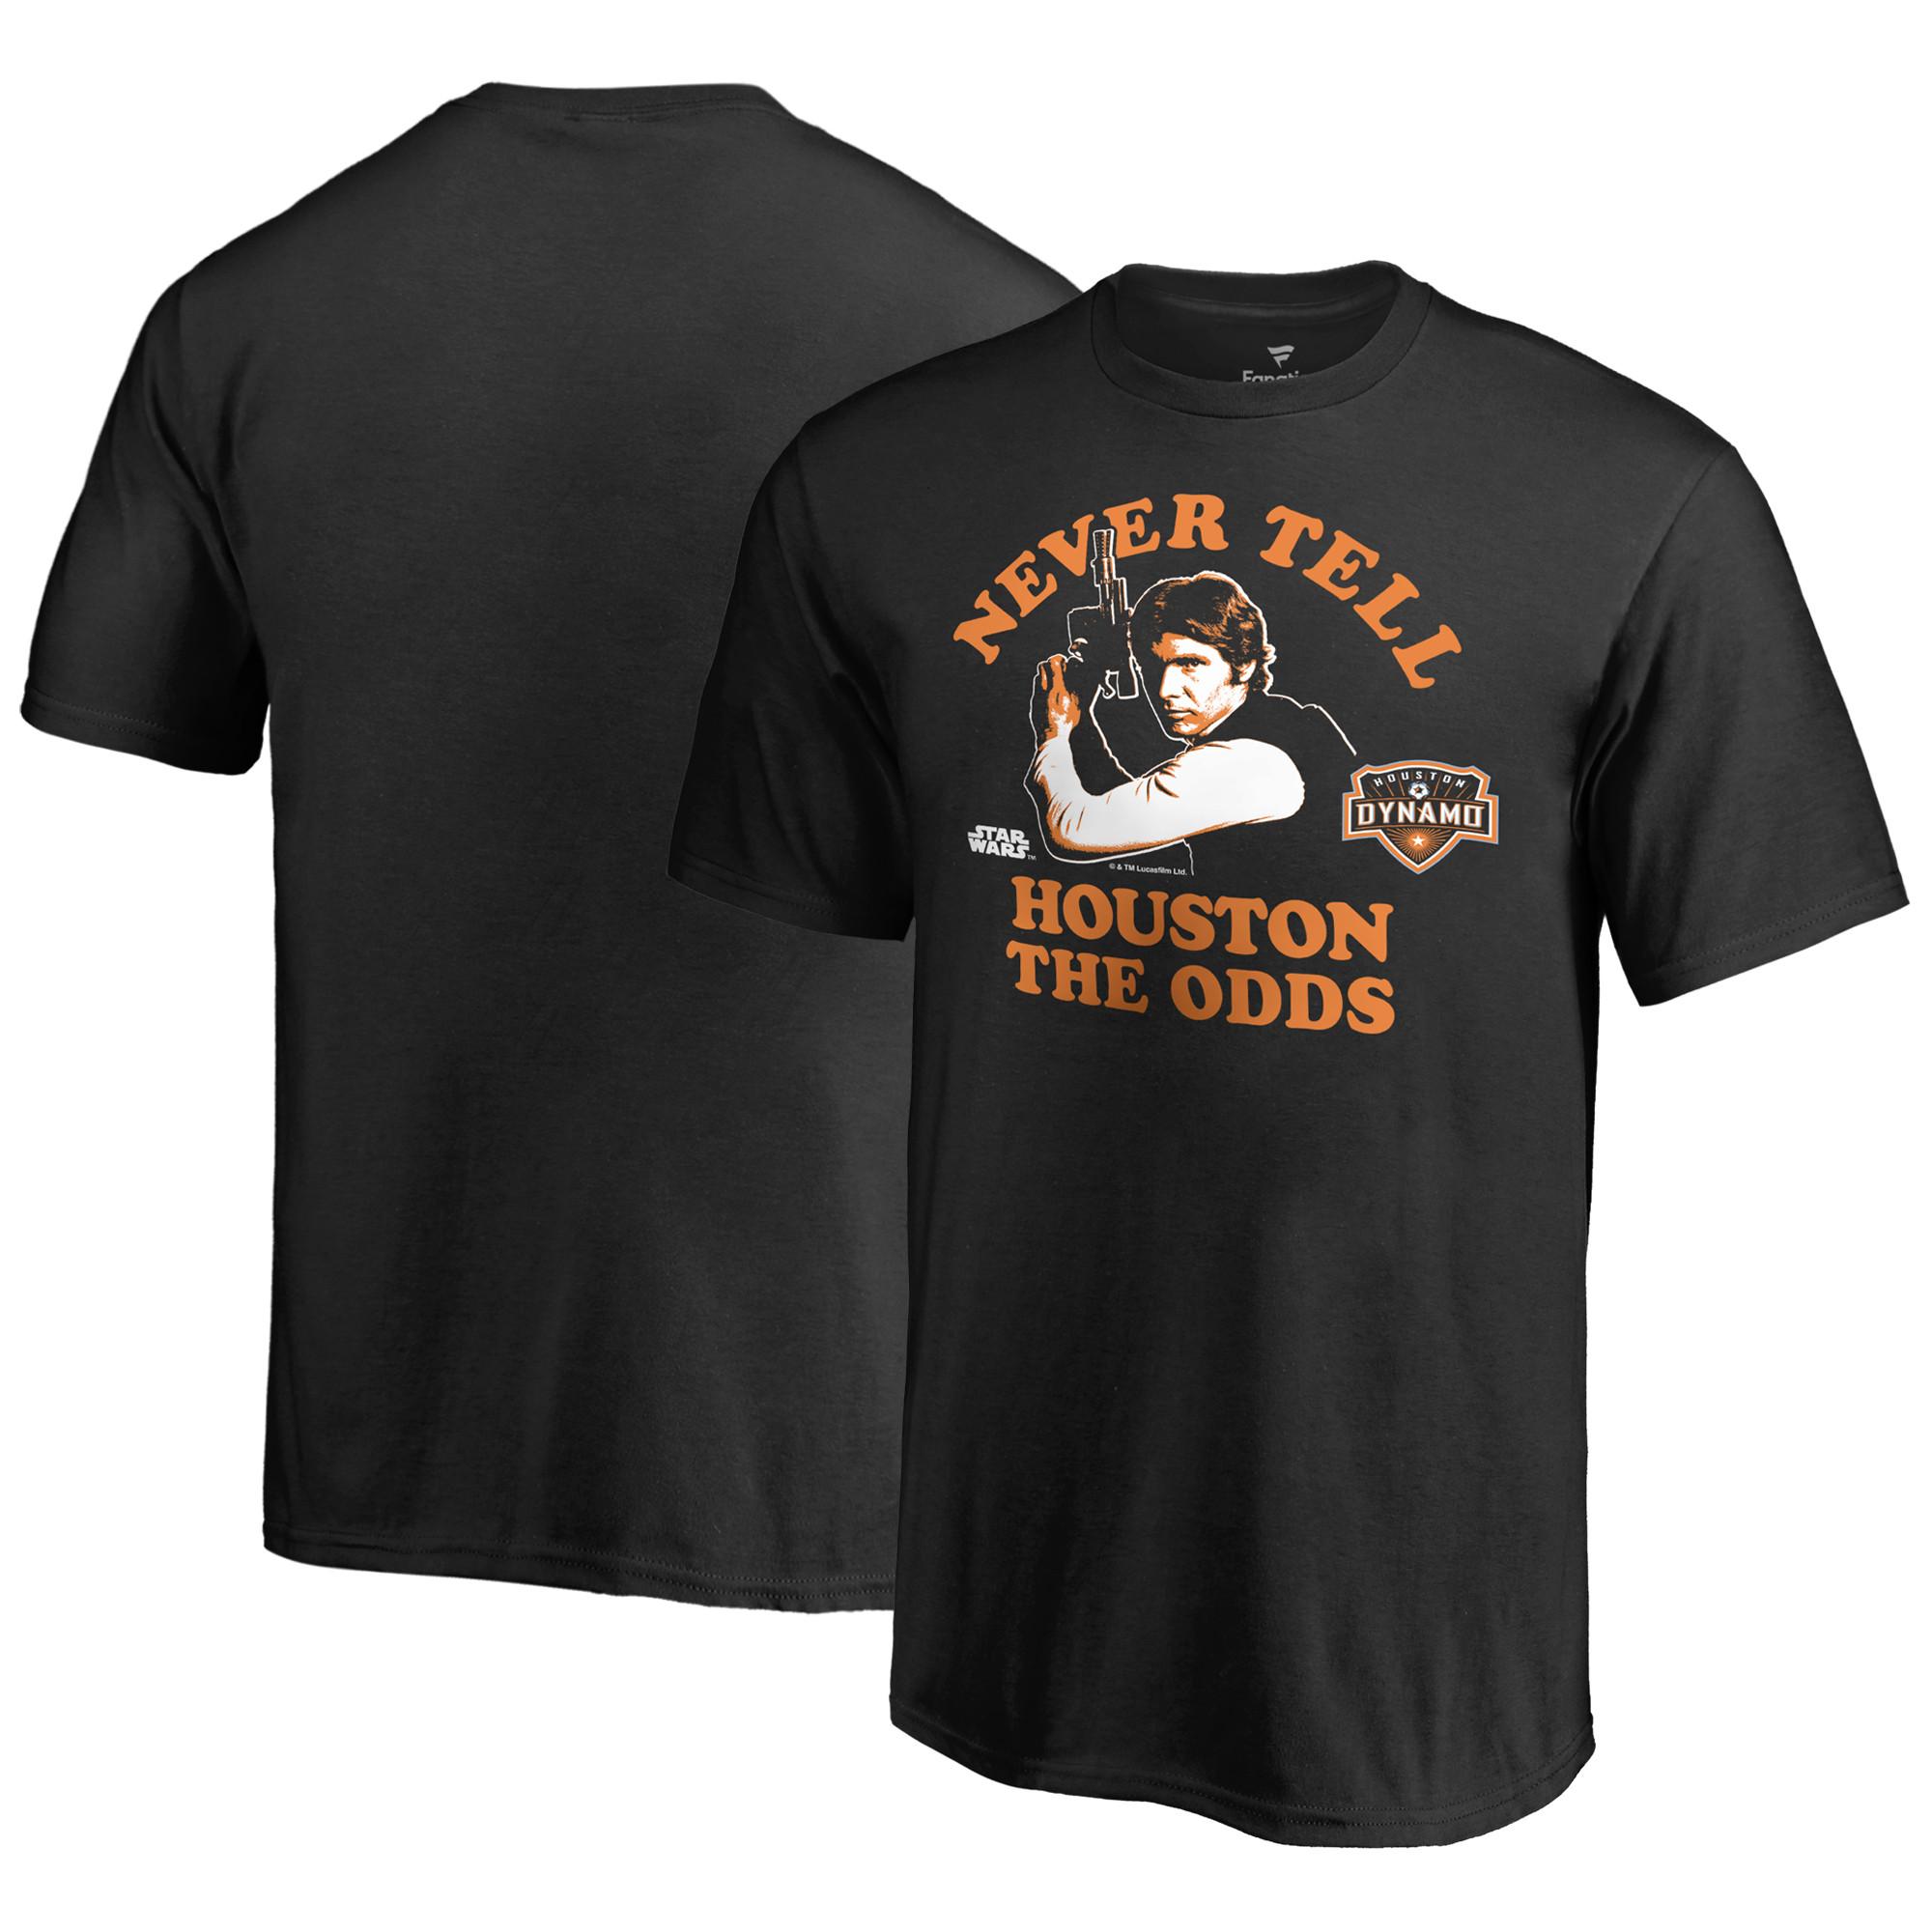 Houston Dynamo Fanatics Branded Youth Star Wars Never Tell the Odds T-Shirt - Black